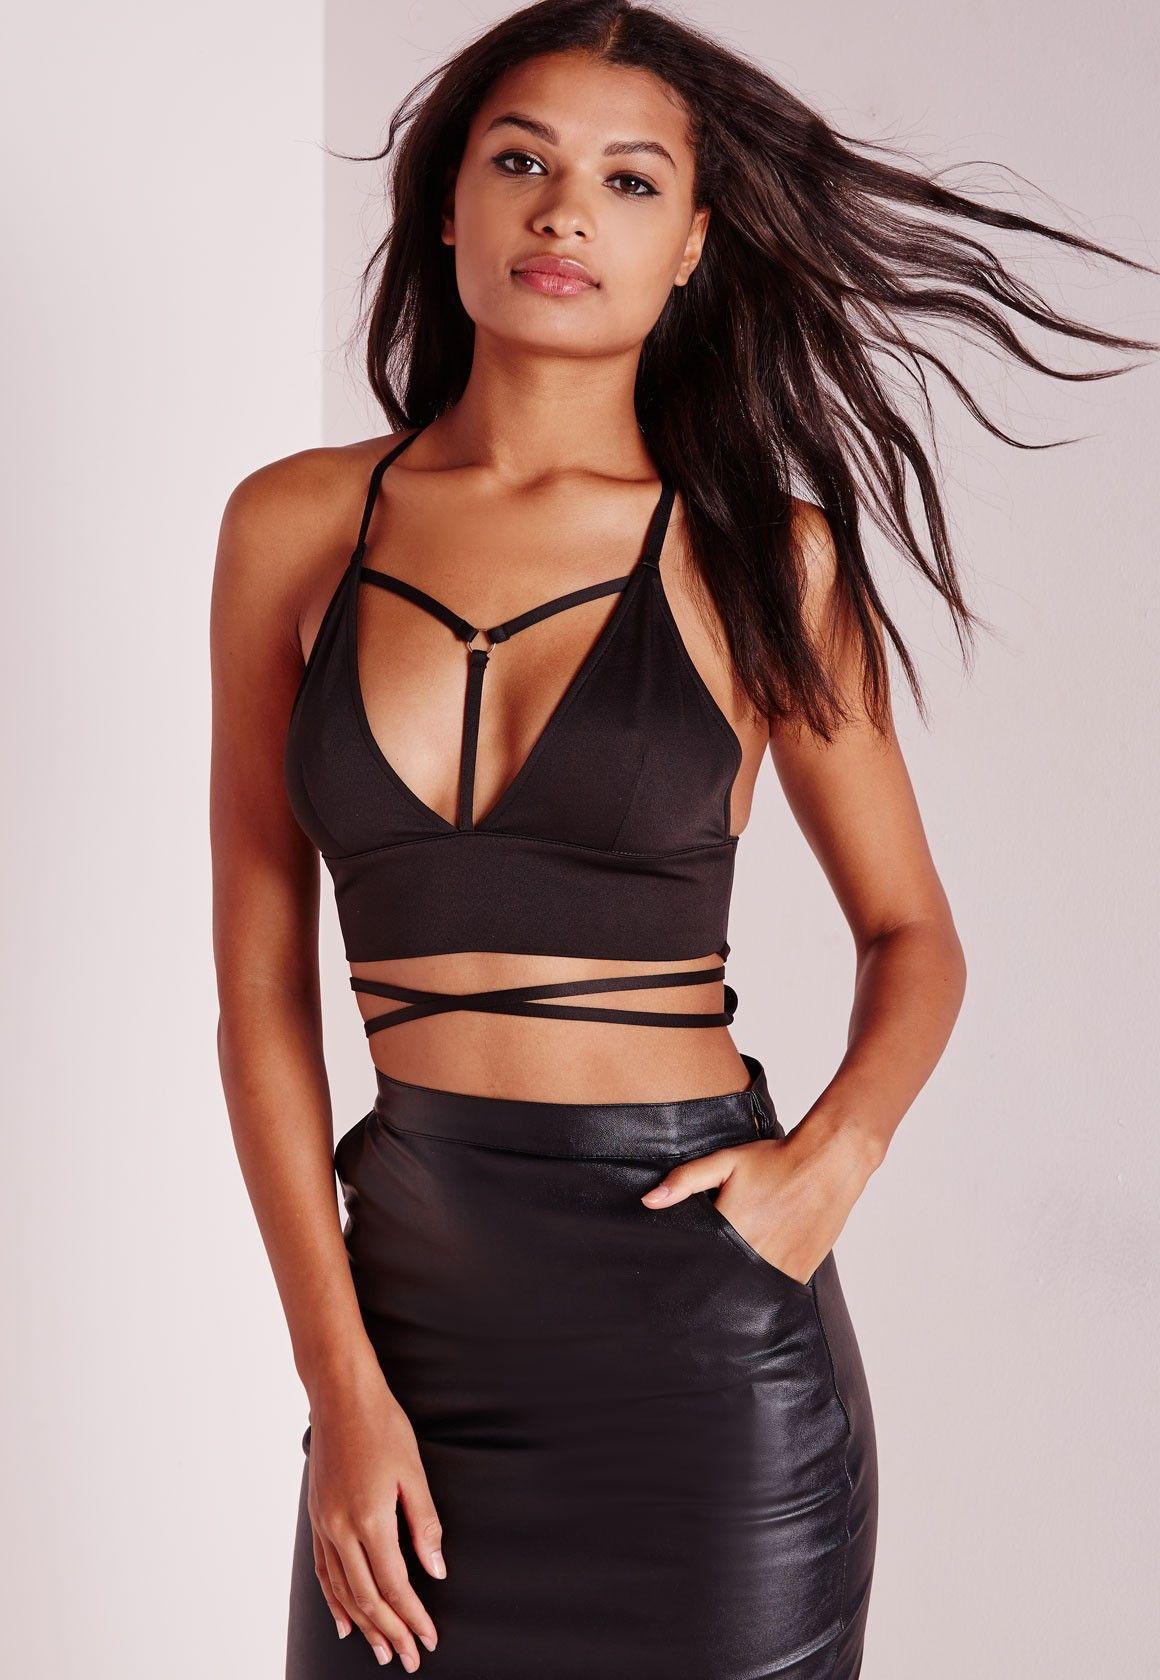 52a18c74b5 Missguided - Wrap Around Harness Bralet Black